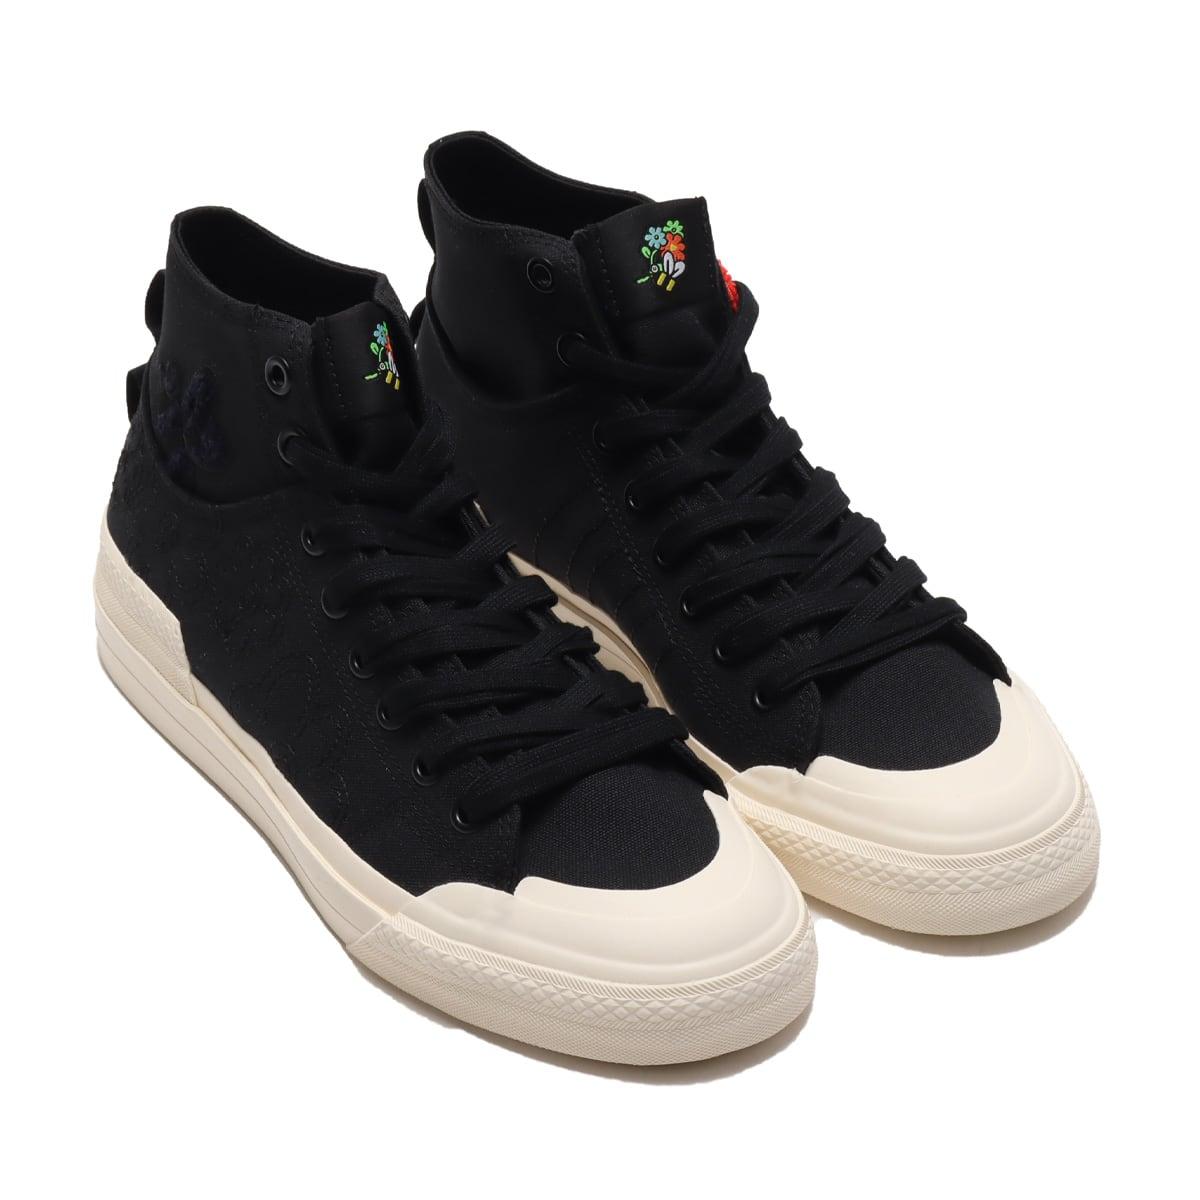 adidas NIZZA HI DL CORE BLACK/CORE BLACK/CORE WHITE 21SS-S_photo_large